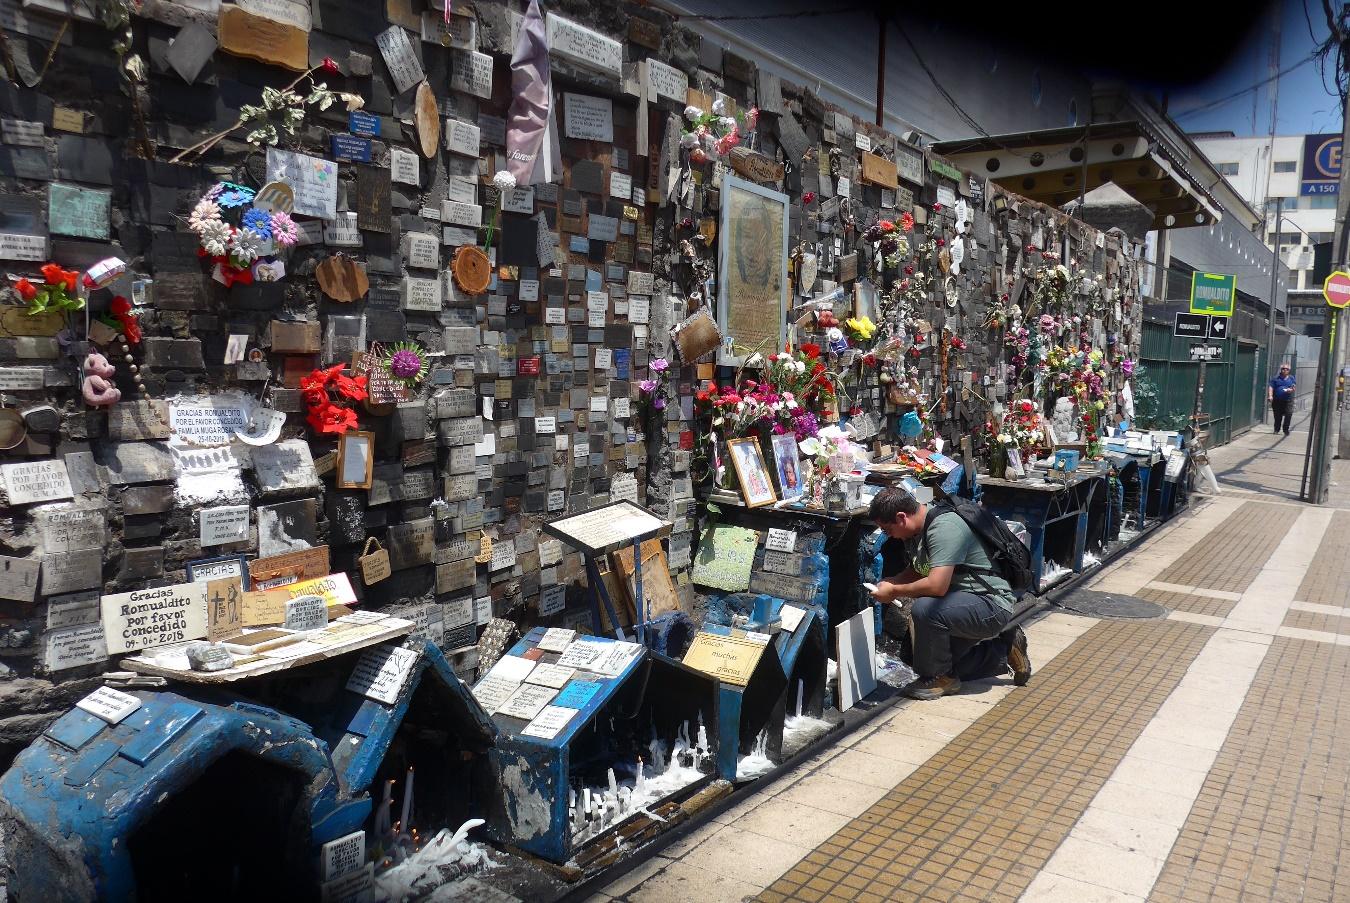 Mur d'ex-voto à l'animita[1] de Romualdito, Santiago du Chili, 17 novembre 2018 . Photo Renée de la Torre.